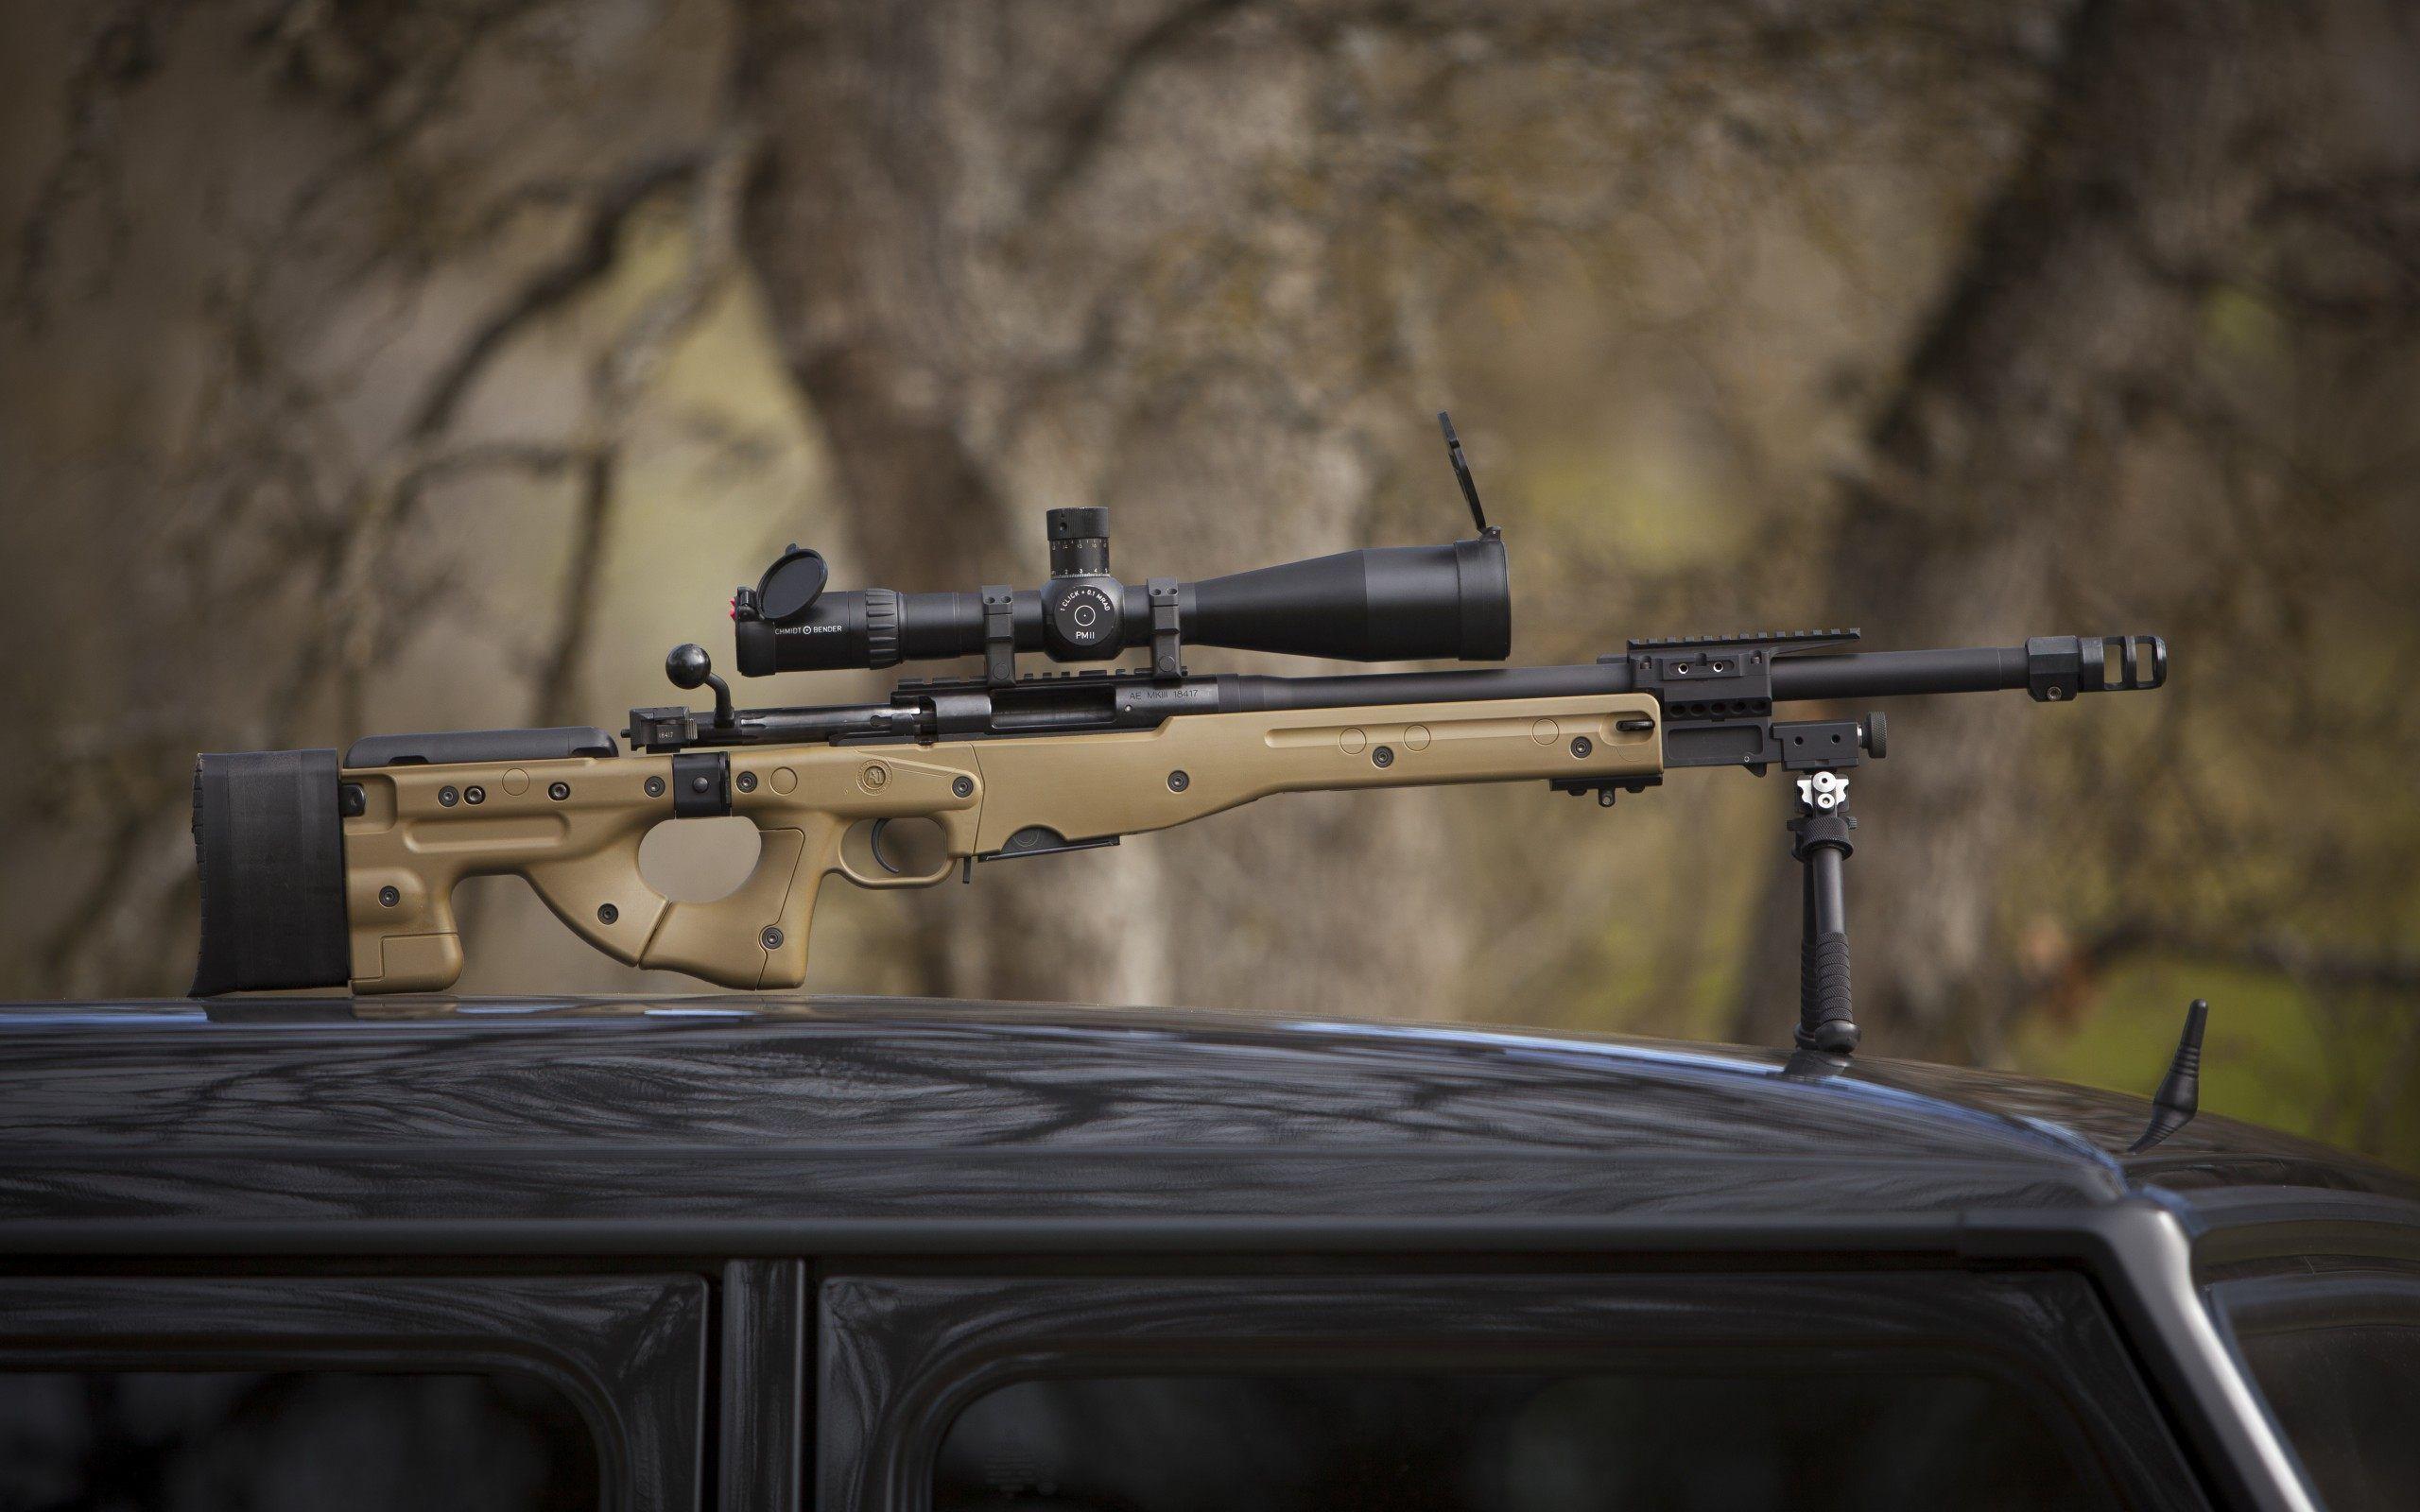 Sniper Rifle Wallpapers - Wallpaper Cave |Sniper Rifle Wallpaper